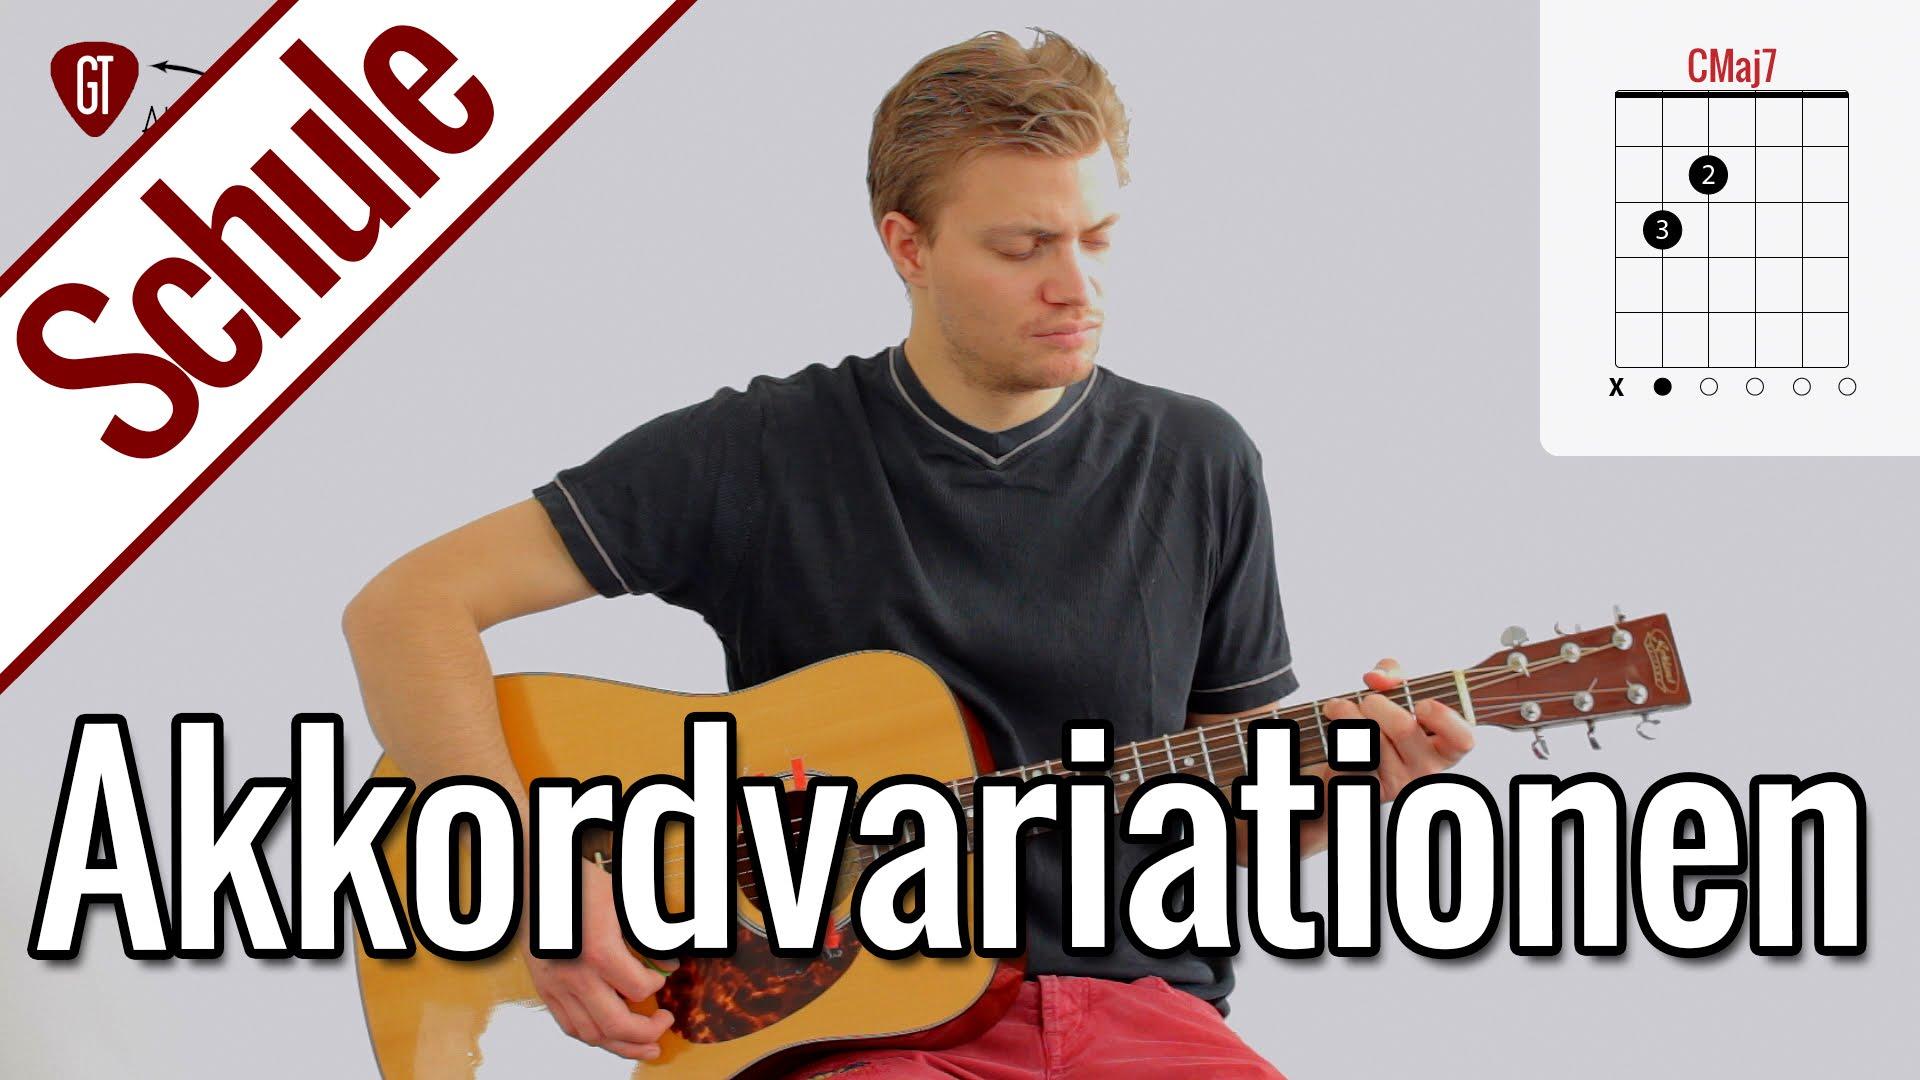 Gitarre lernen – Sechste Gitarrenstunde: Coole Akkorde / Akkordvariationen | Gitarrenschule